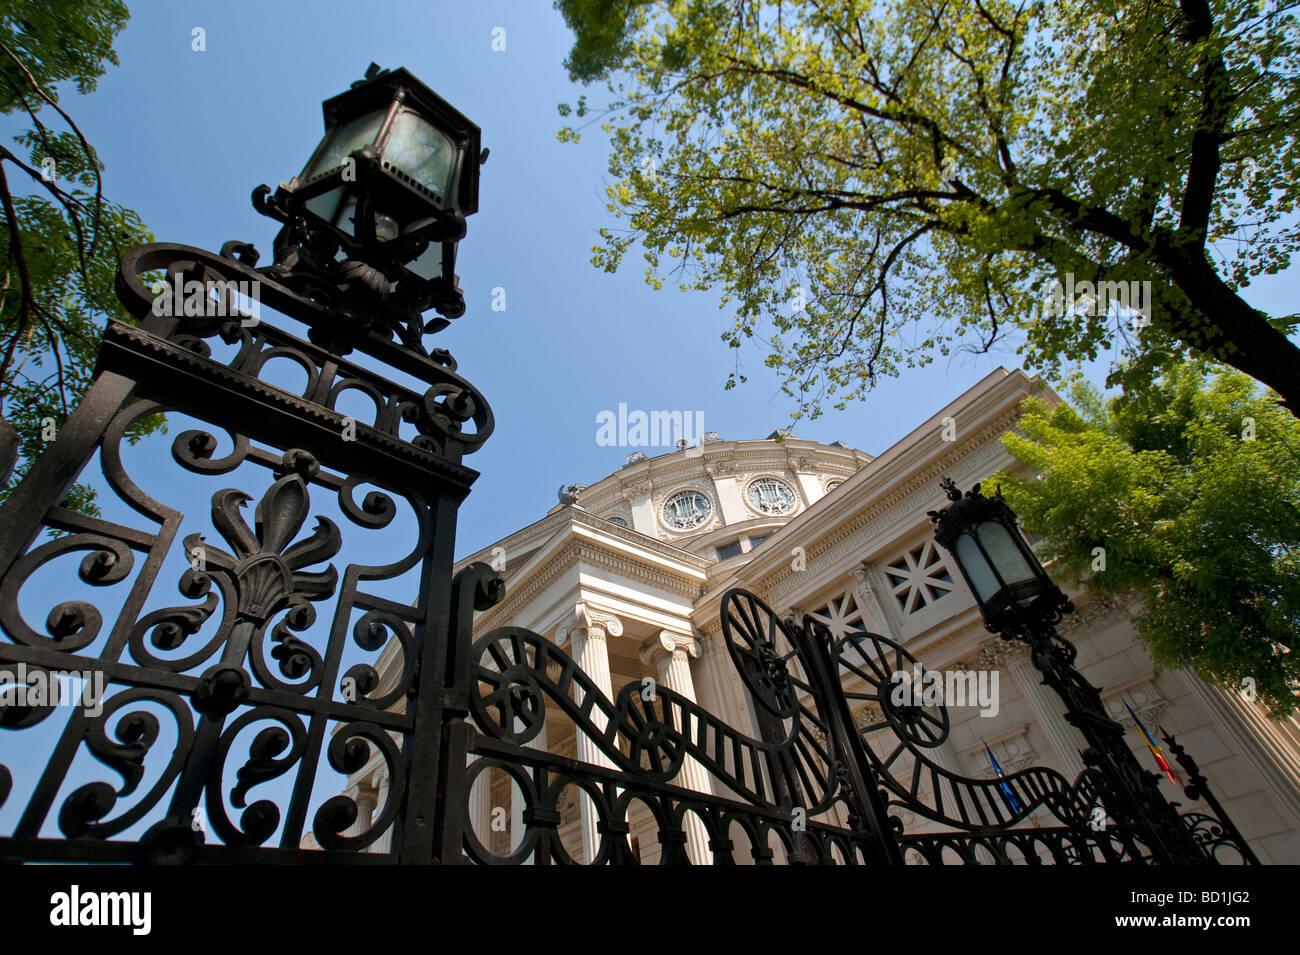 Bucarest Romanian Athenaeum Concert Hall in stile neoclassico Immagini Stock